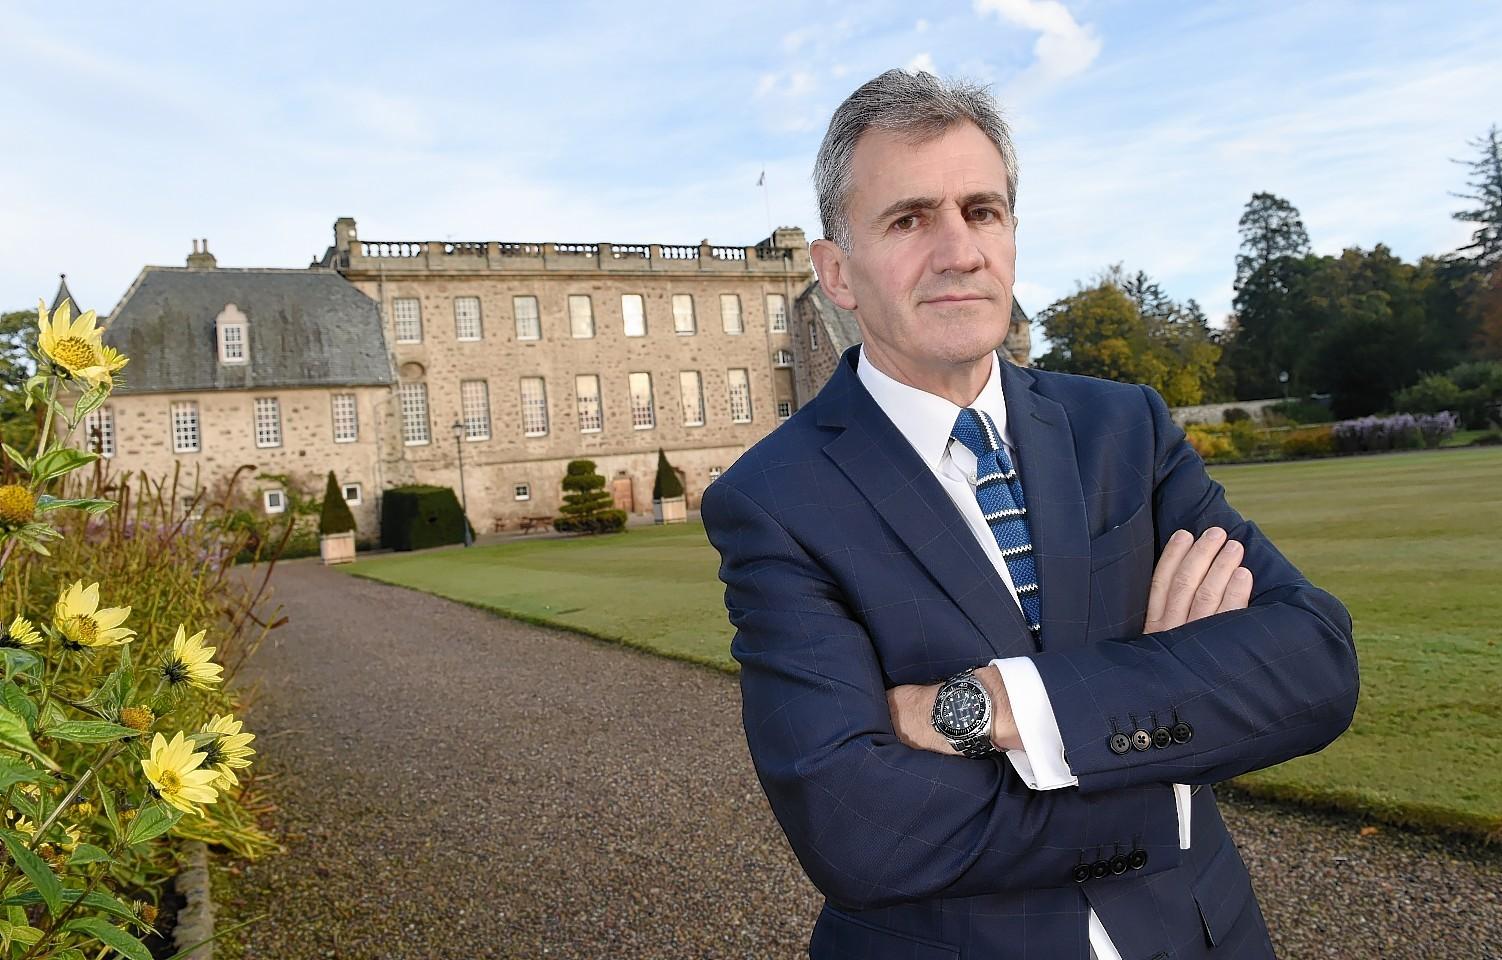 Simon Reid, Headmaster of Gordonstoun